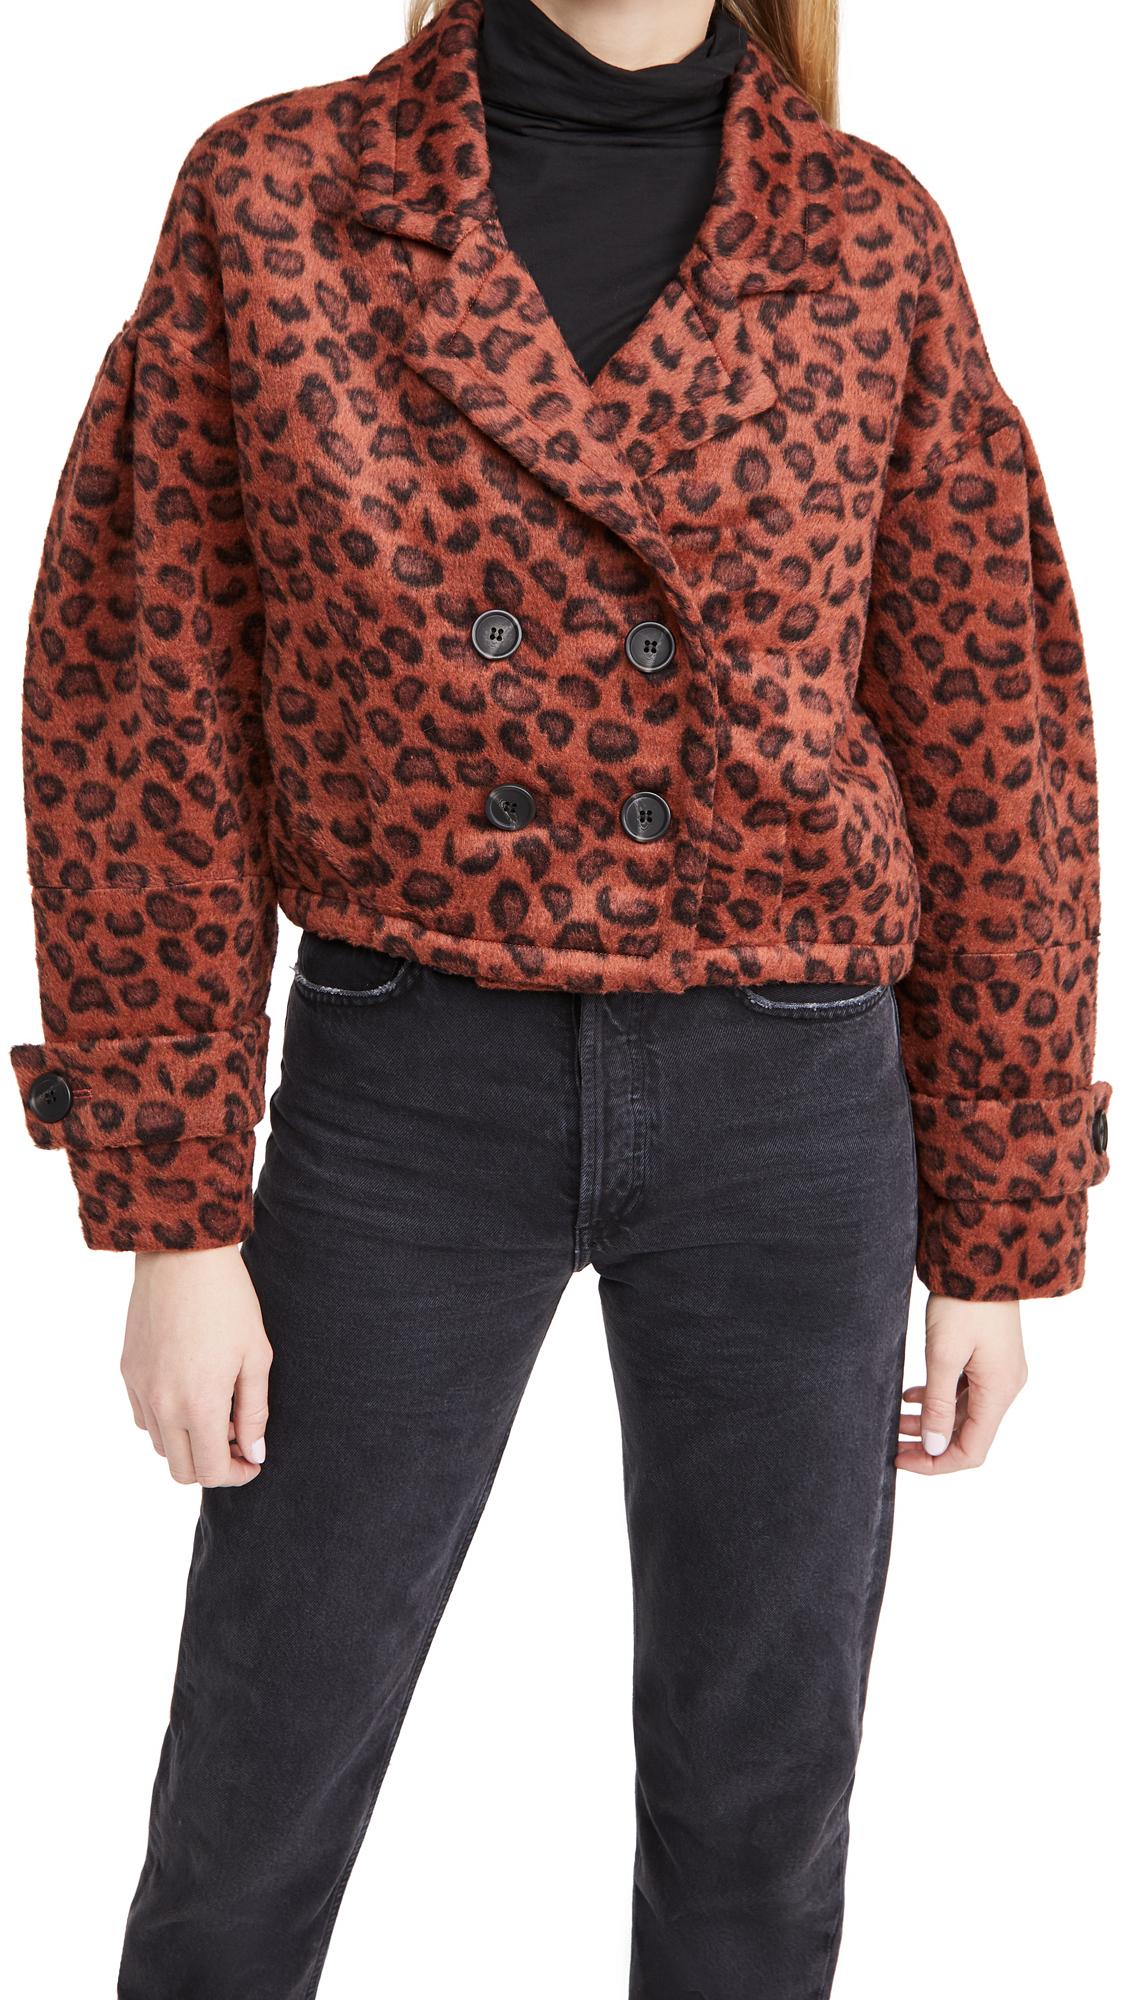 BB Dakota Wow Moment Leopard Brushed Jacket